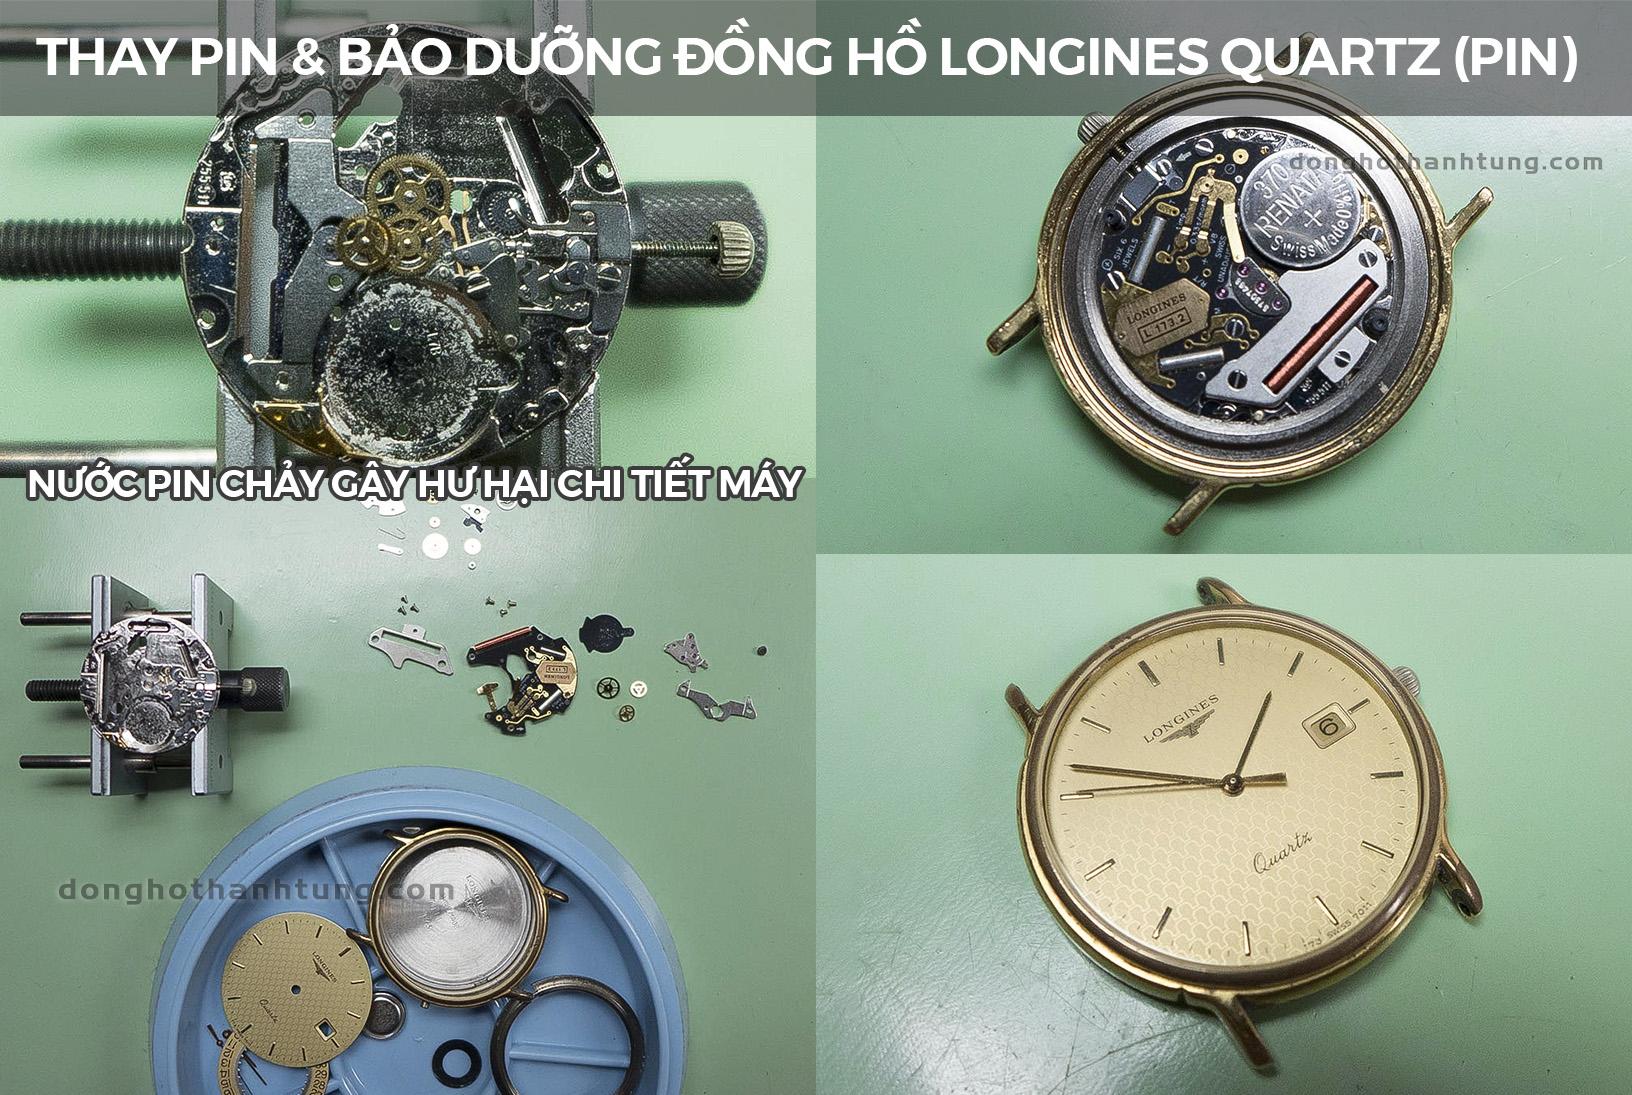 Thay pin đồng hồ đeo tay Longines